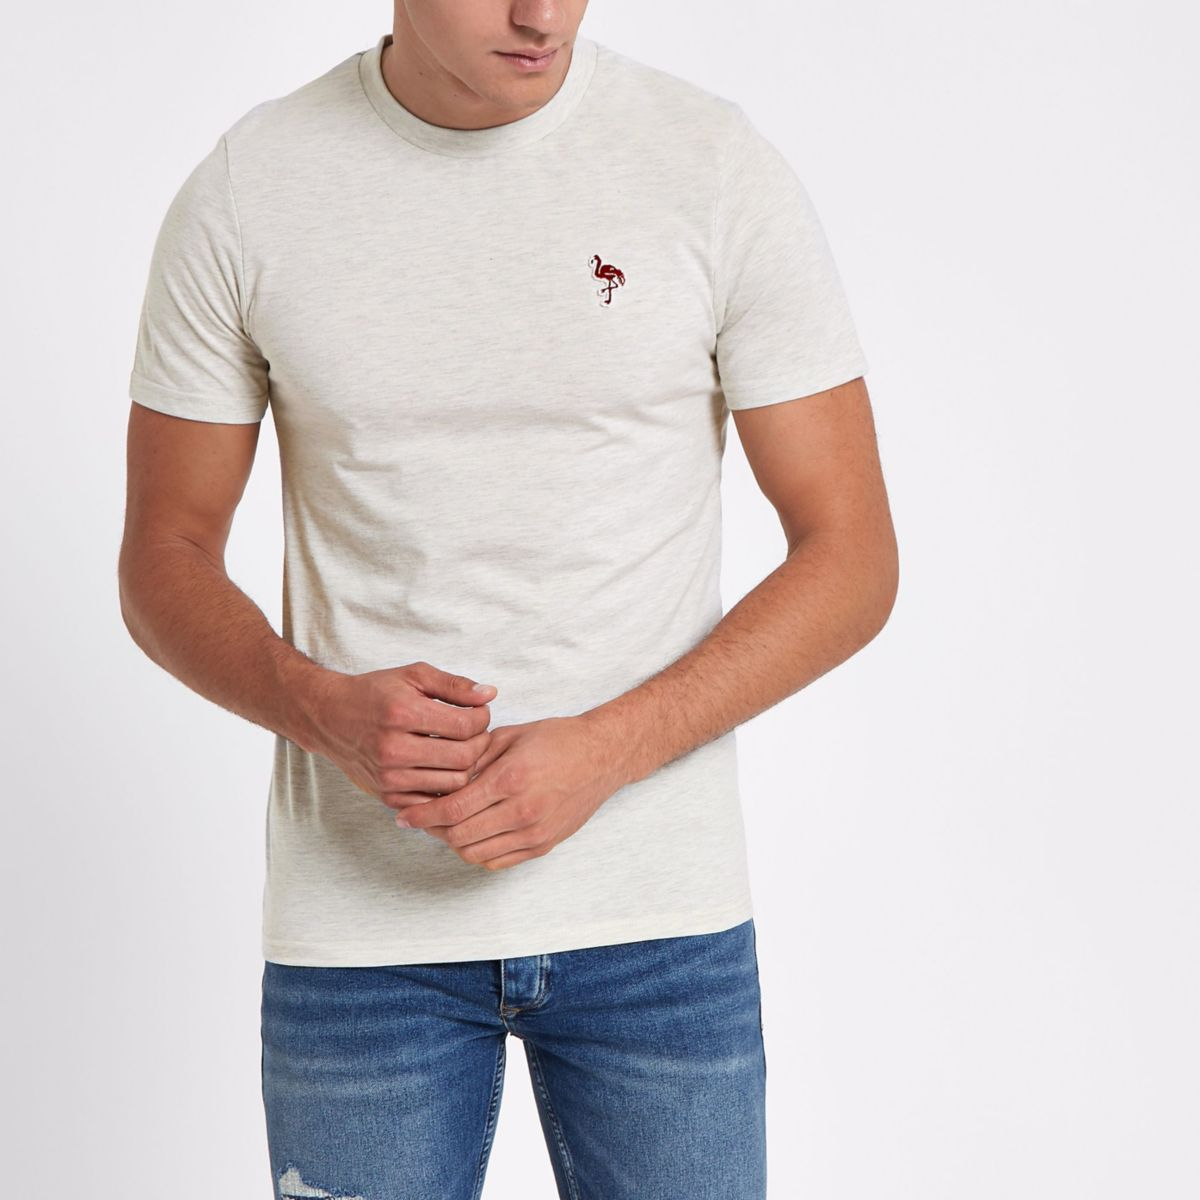 Jack & Jones white embroidered T-shirt